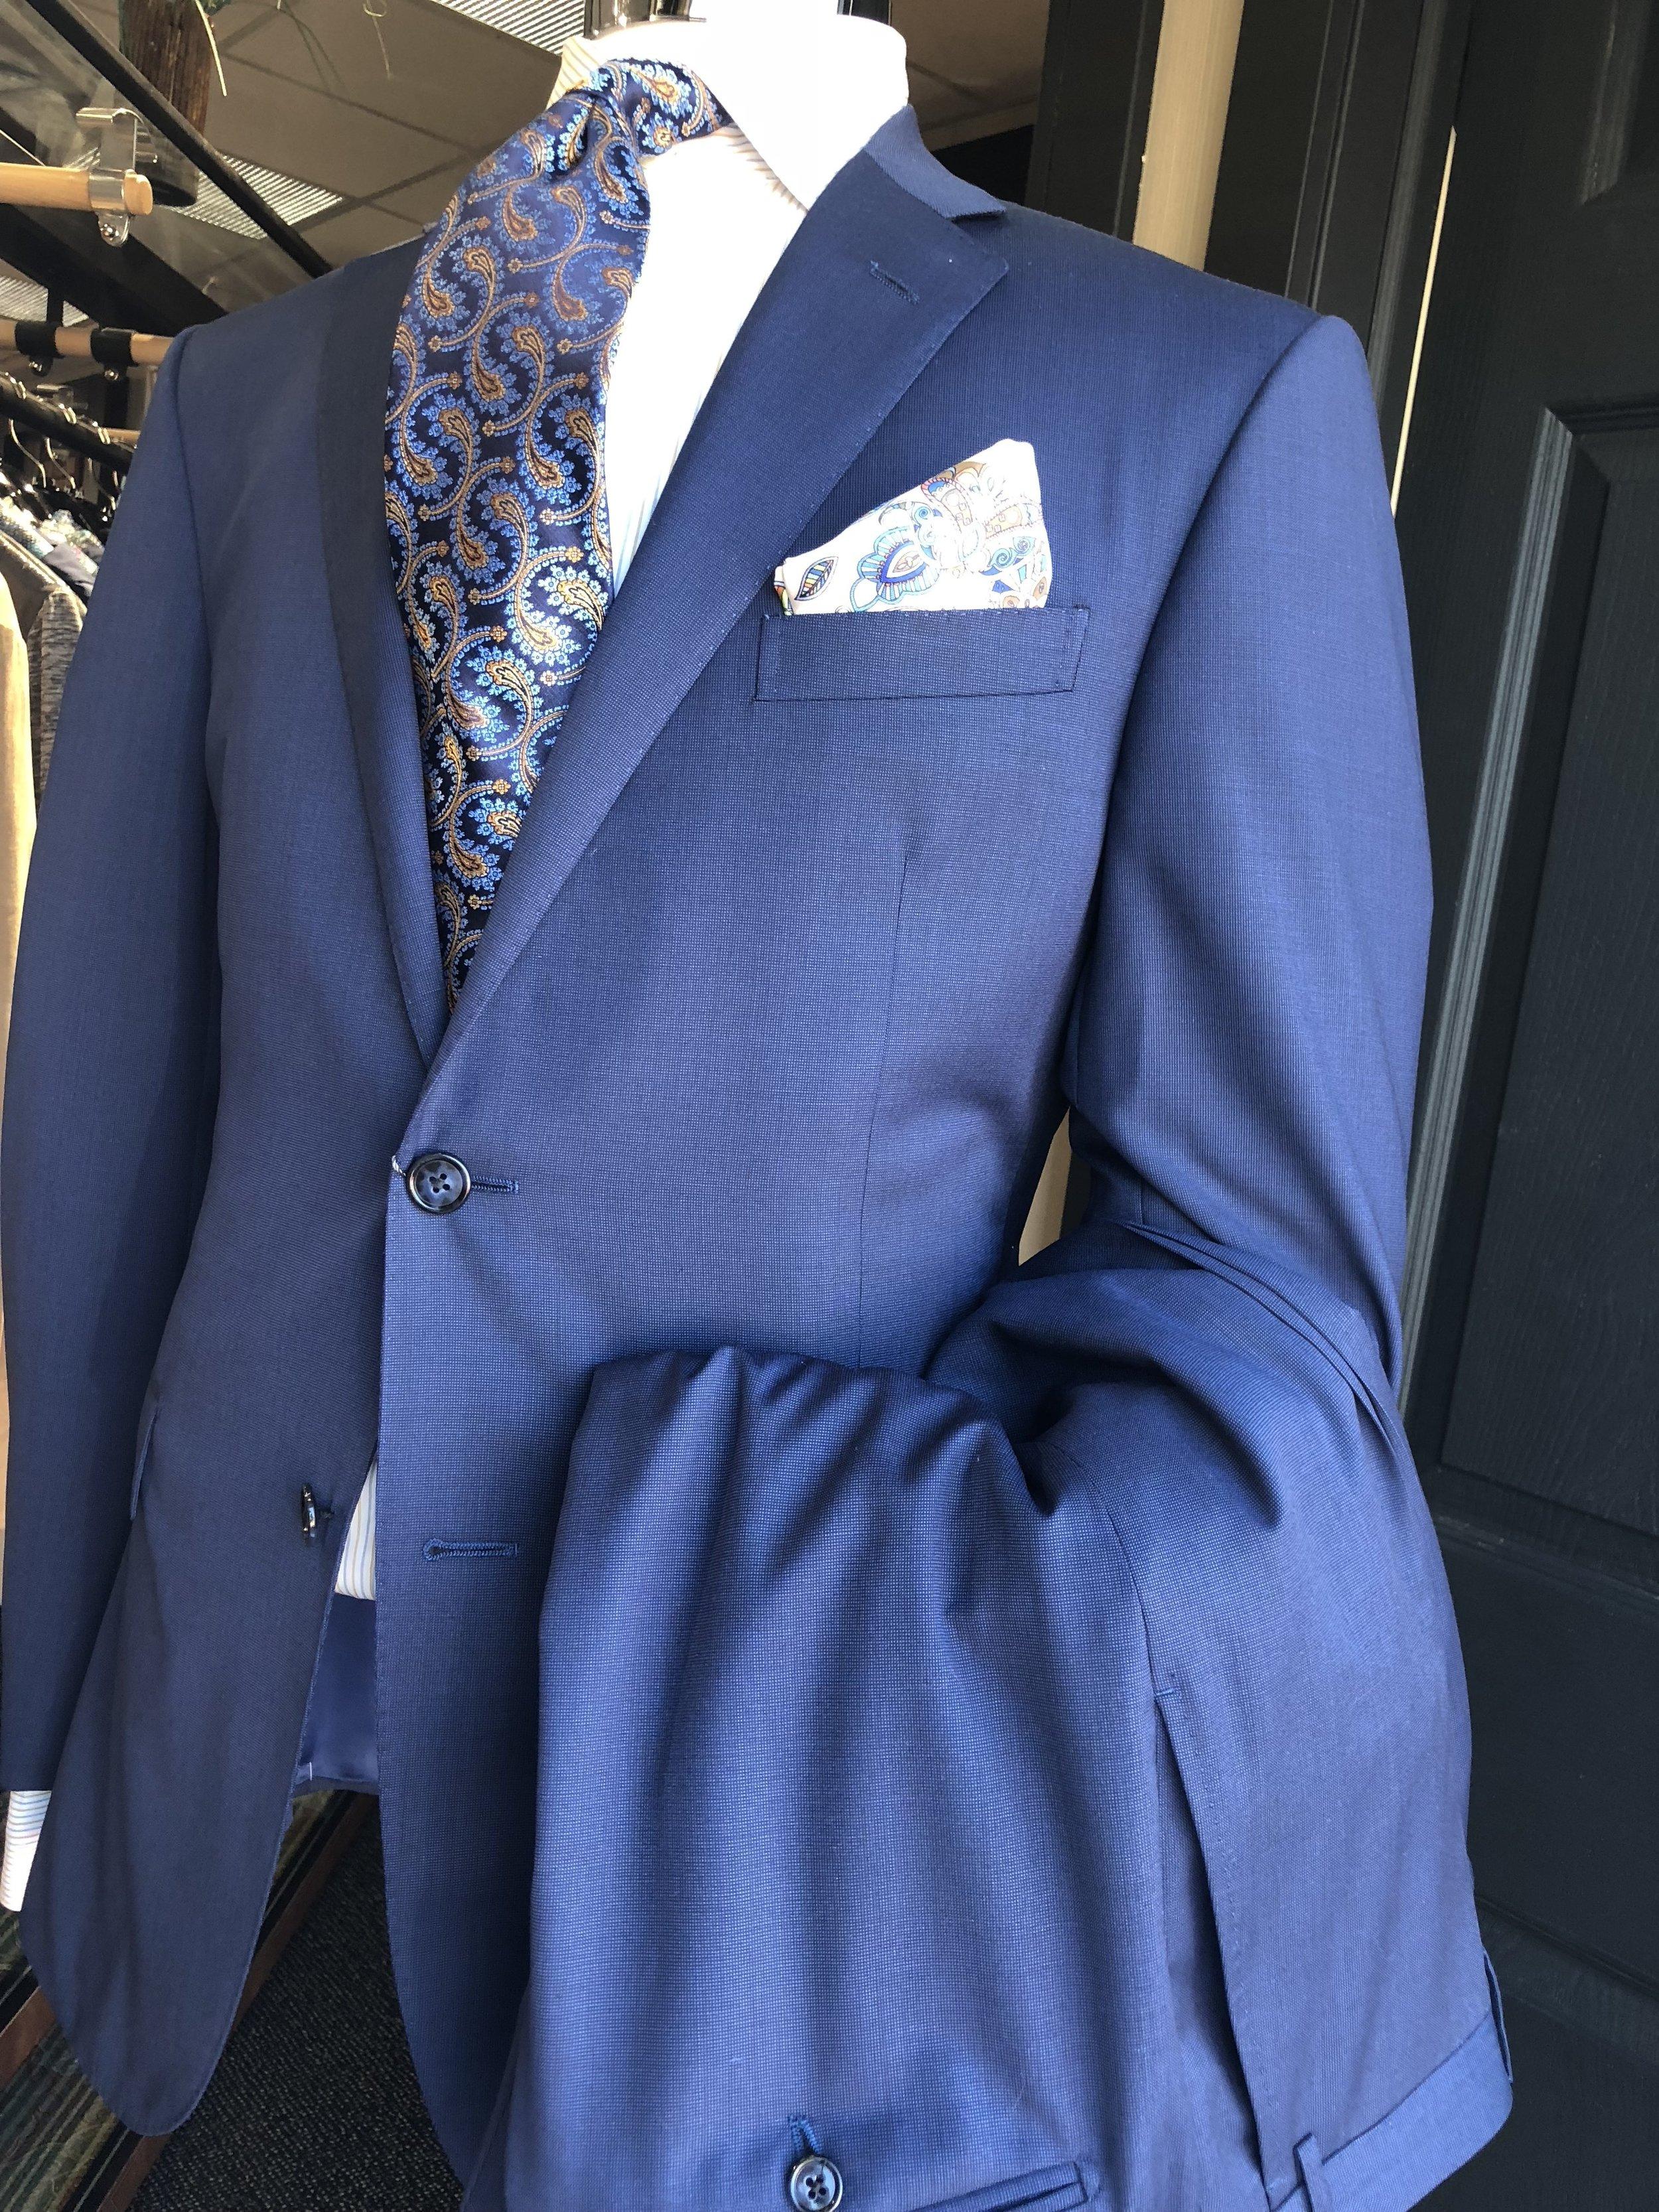 mens-pin-striped-suit.JPG